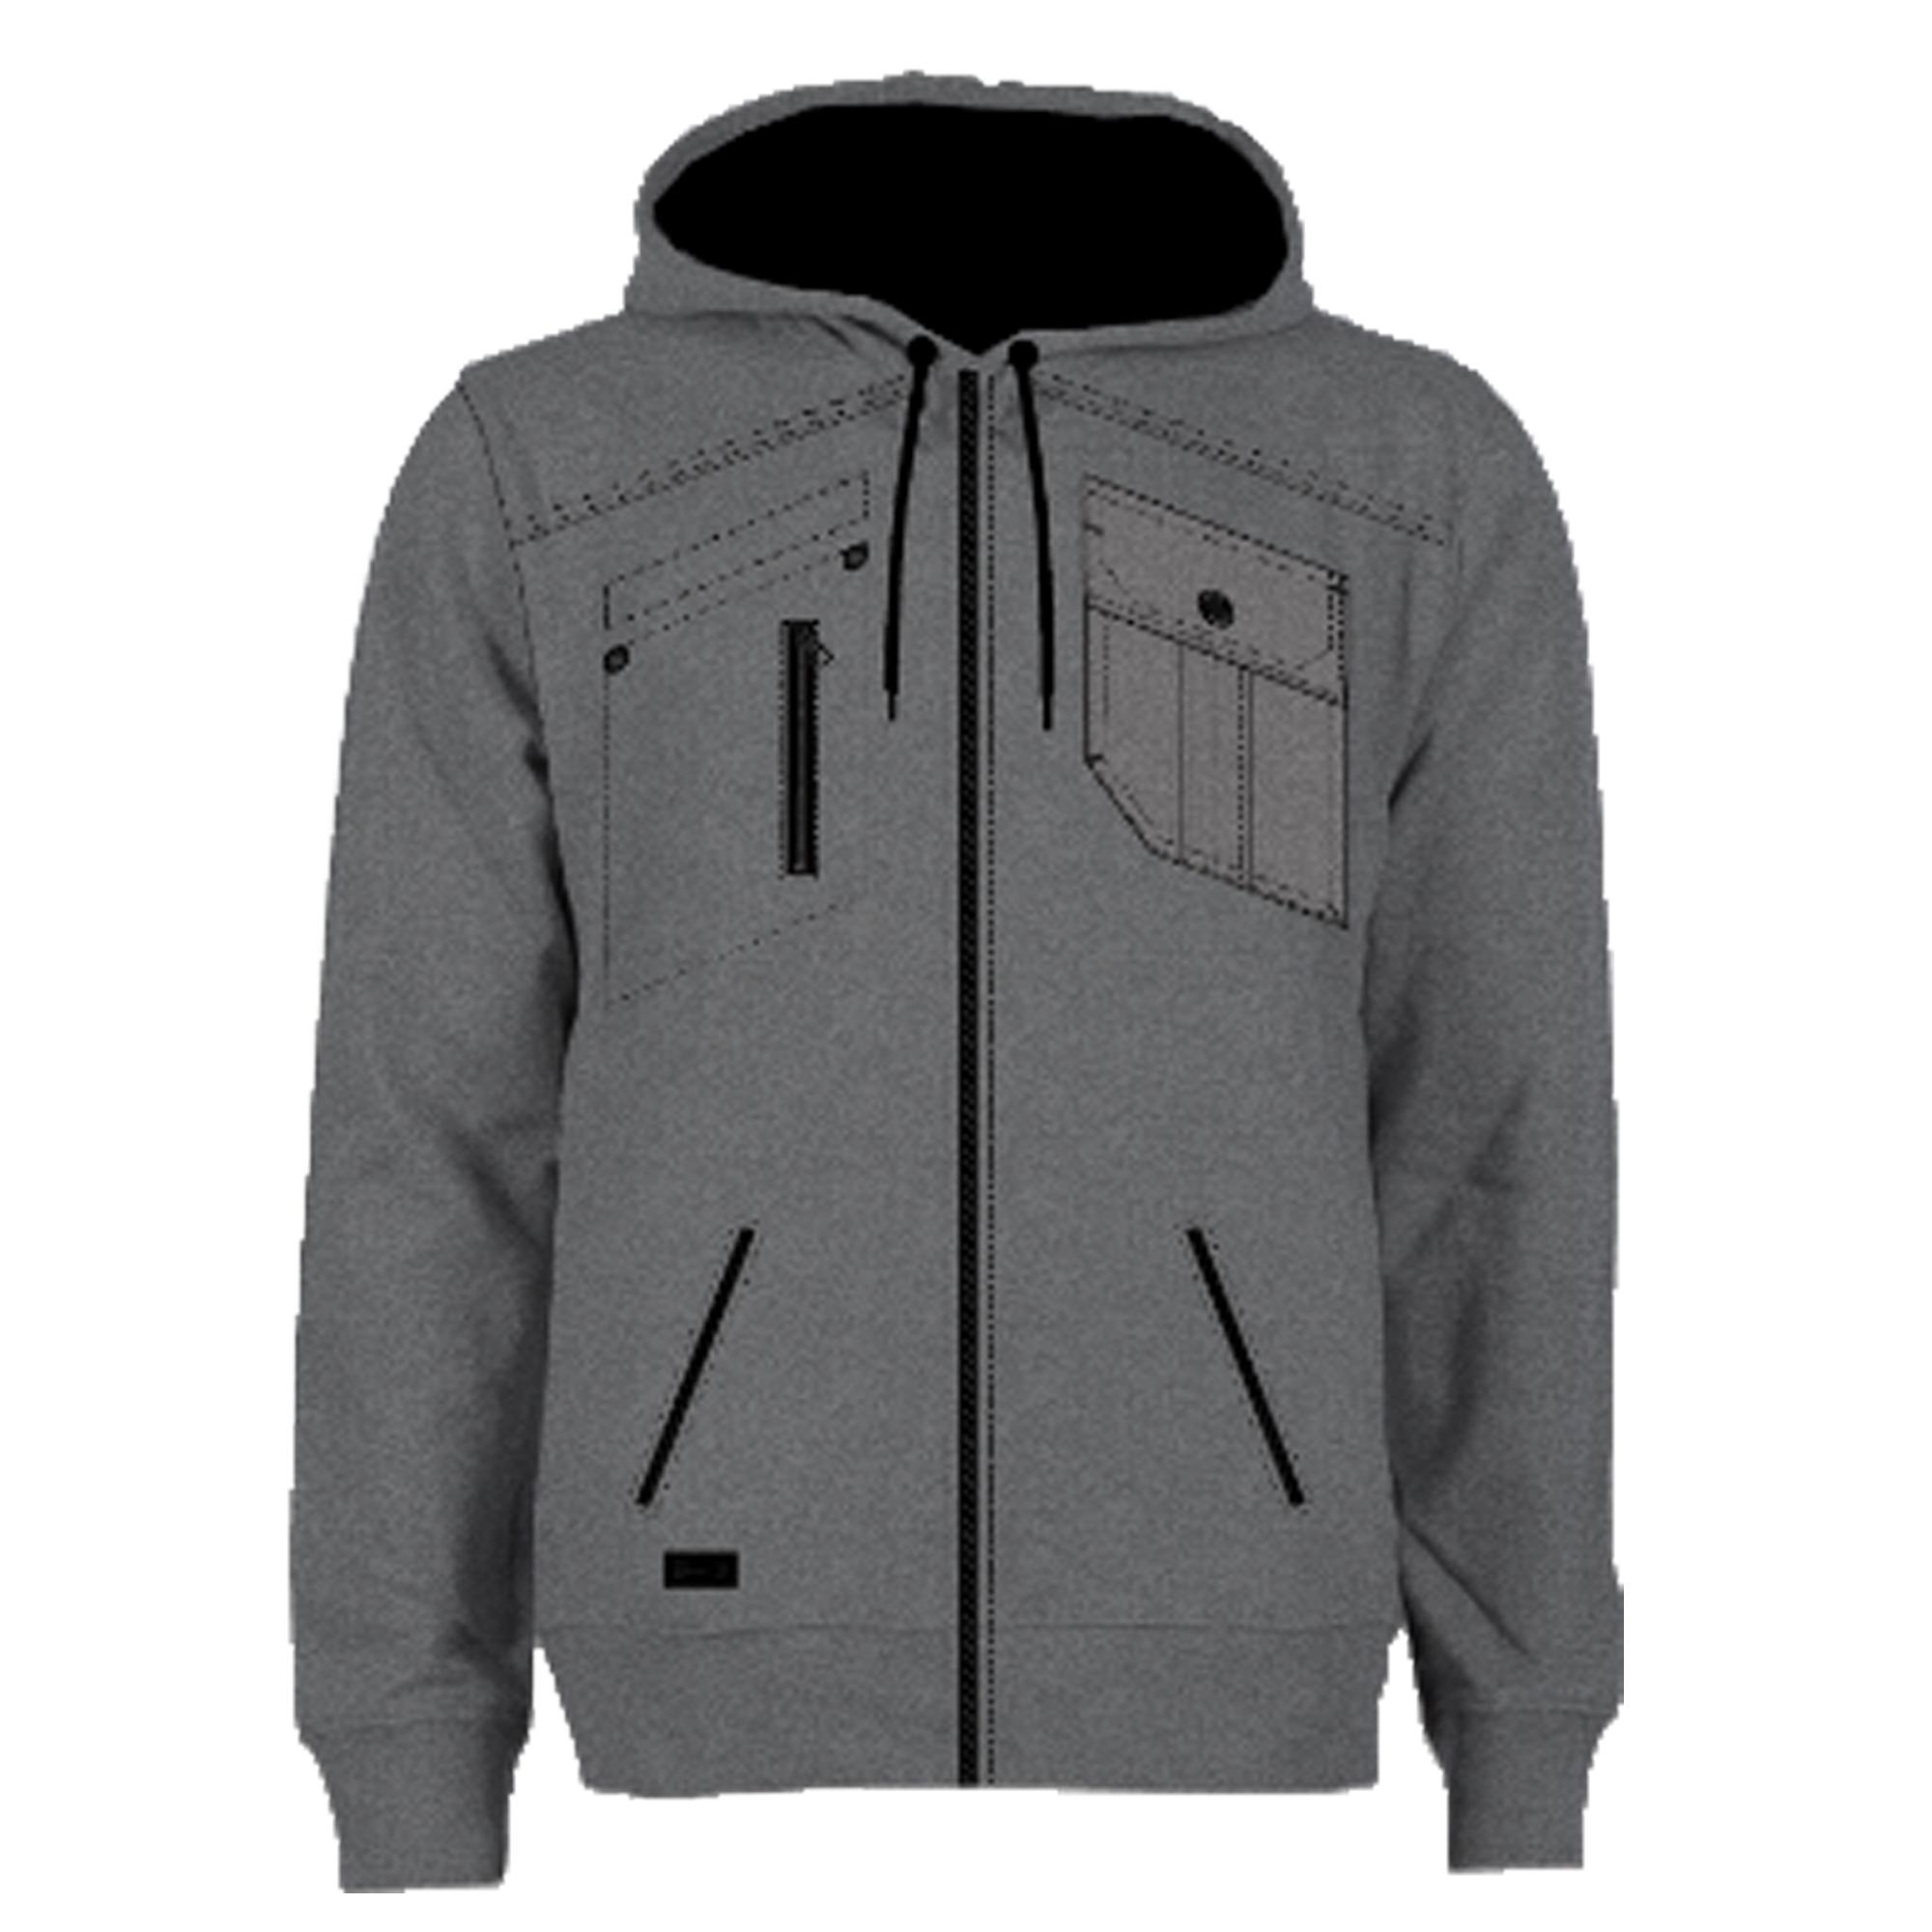 Mens-Jacket-Dissident-Sweatshirt-Hooded-Top-Sherpa-Fleece-Lined-Heavy-BOLO-New thumbnail 16